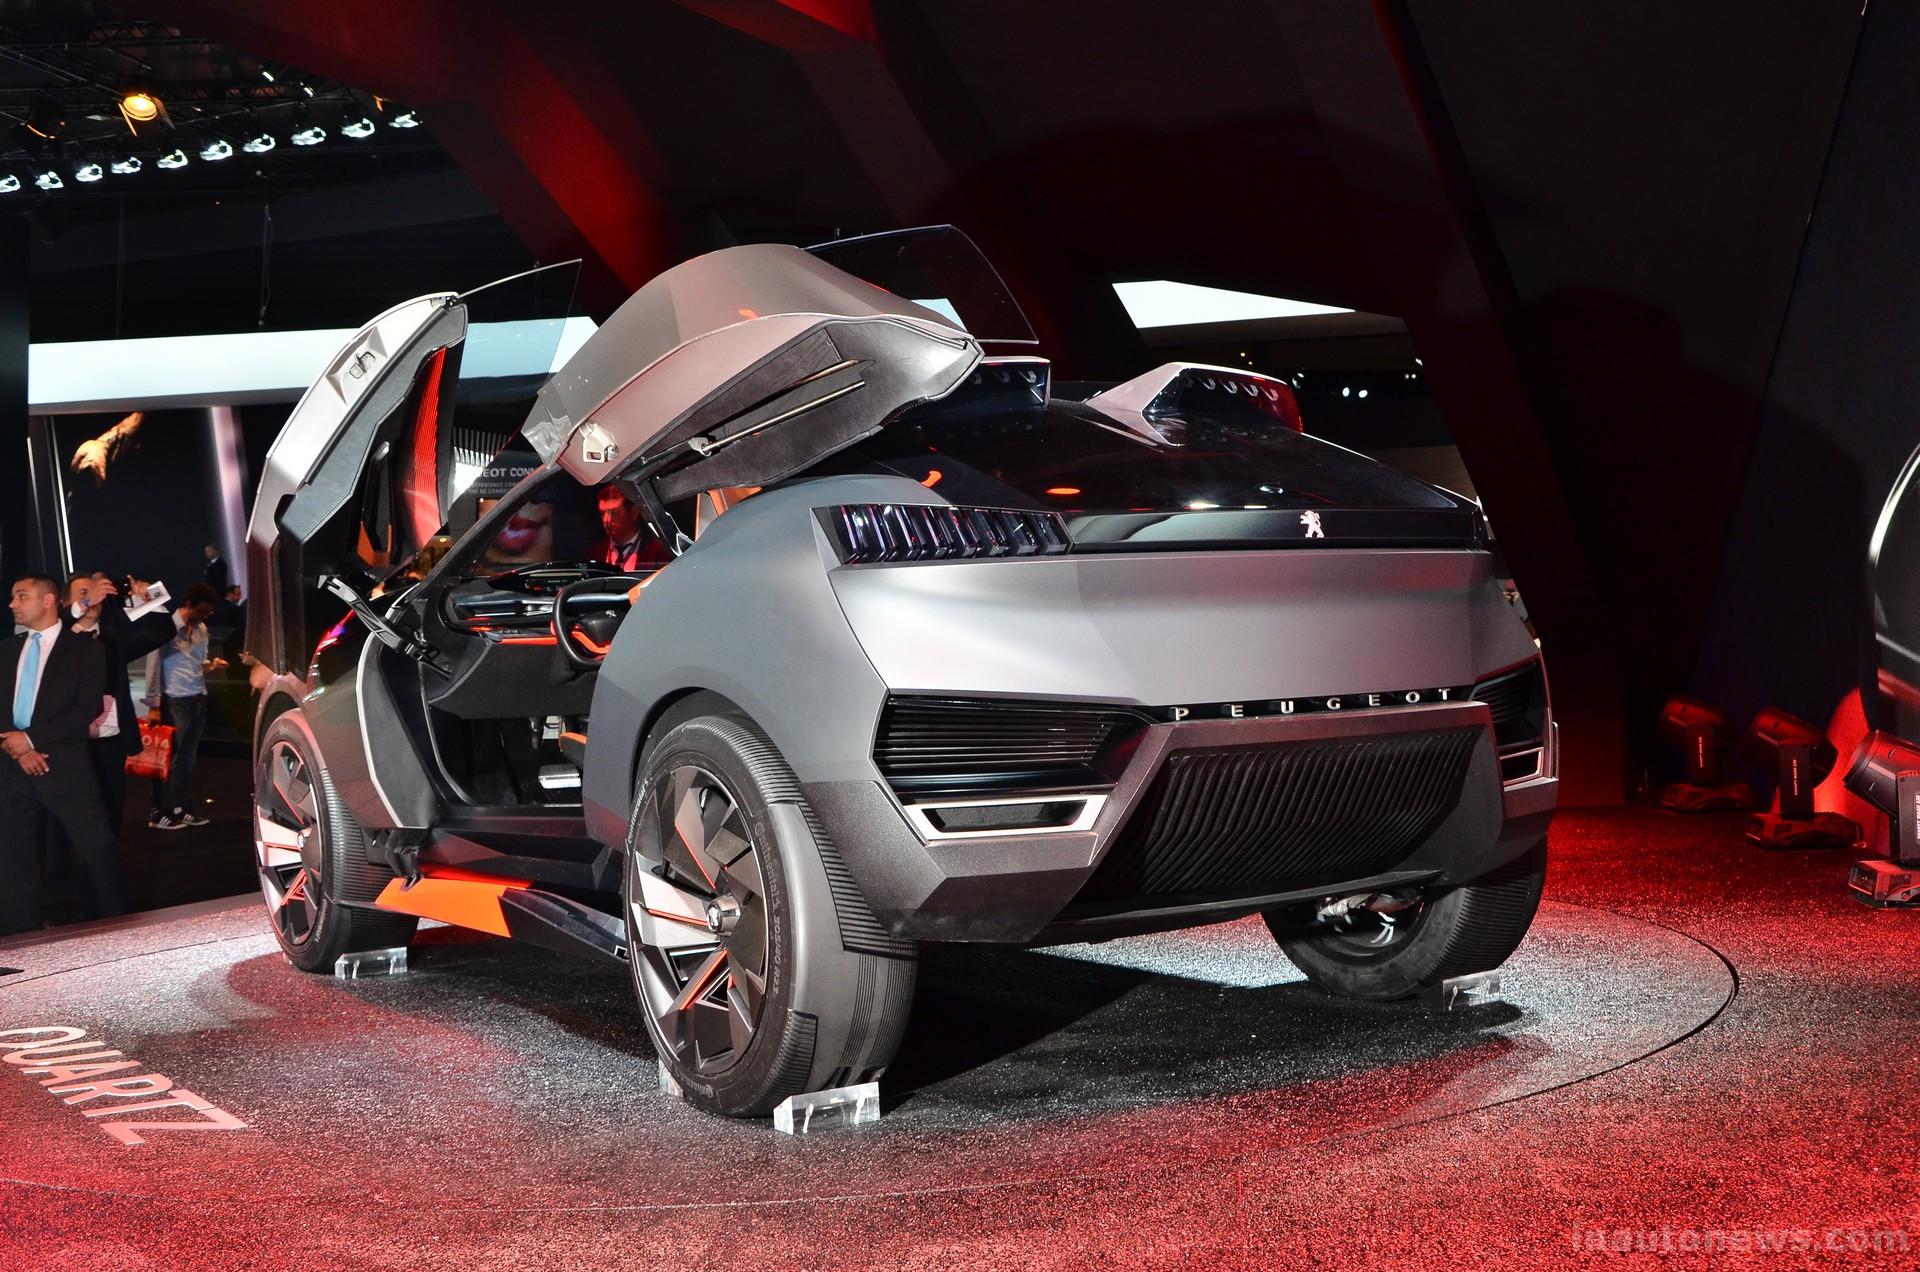 Peugeot Quartz Photos Photogallery With 15 Pics